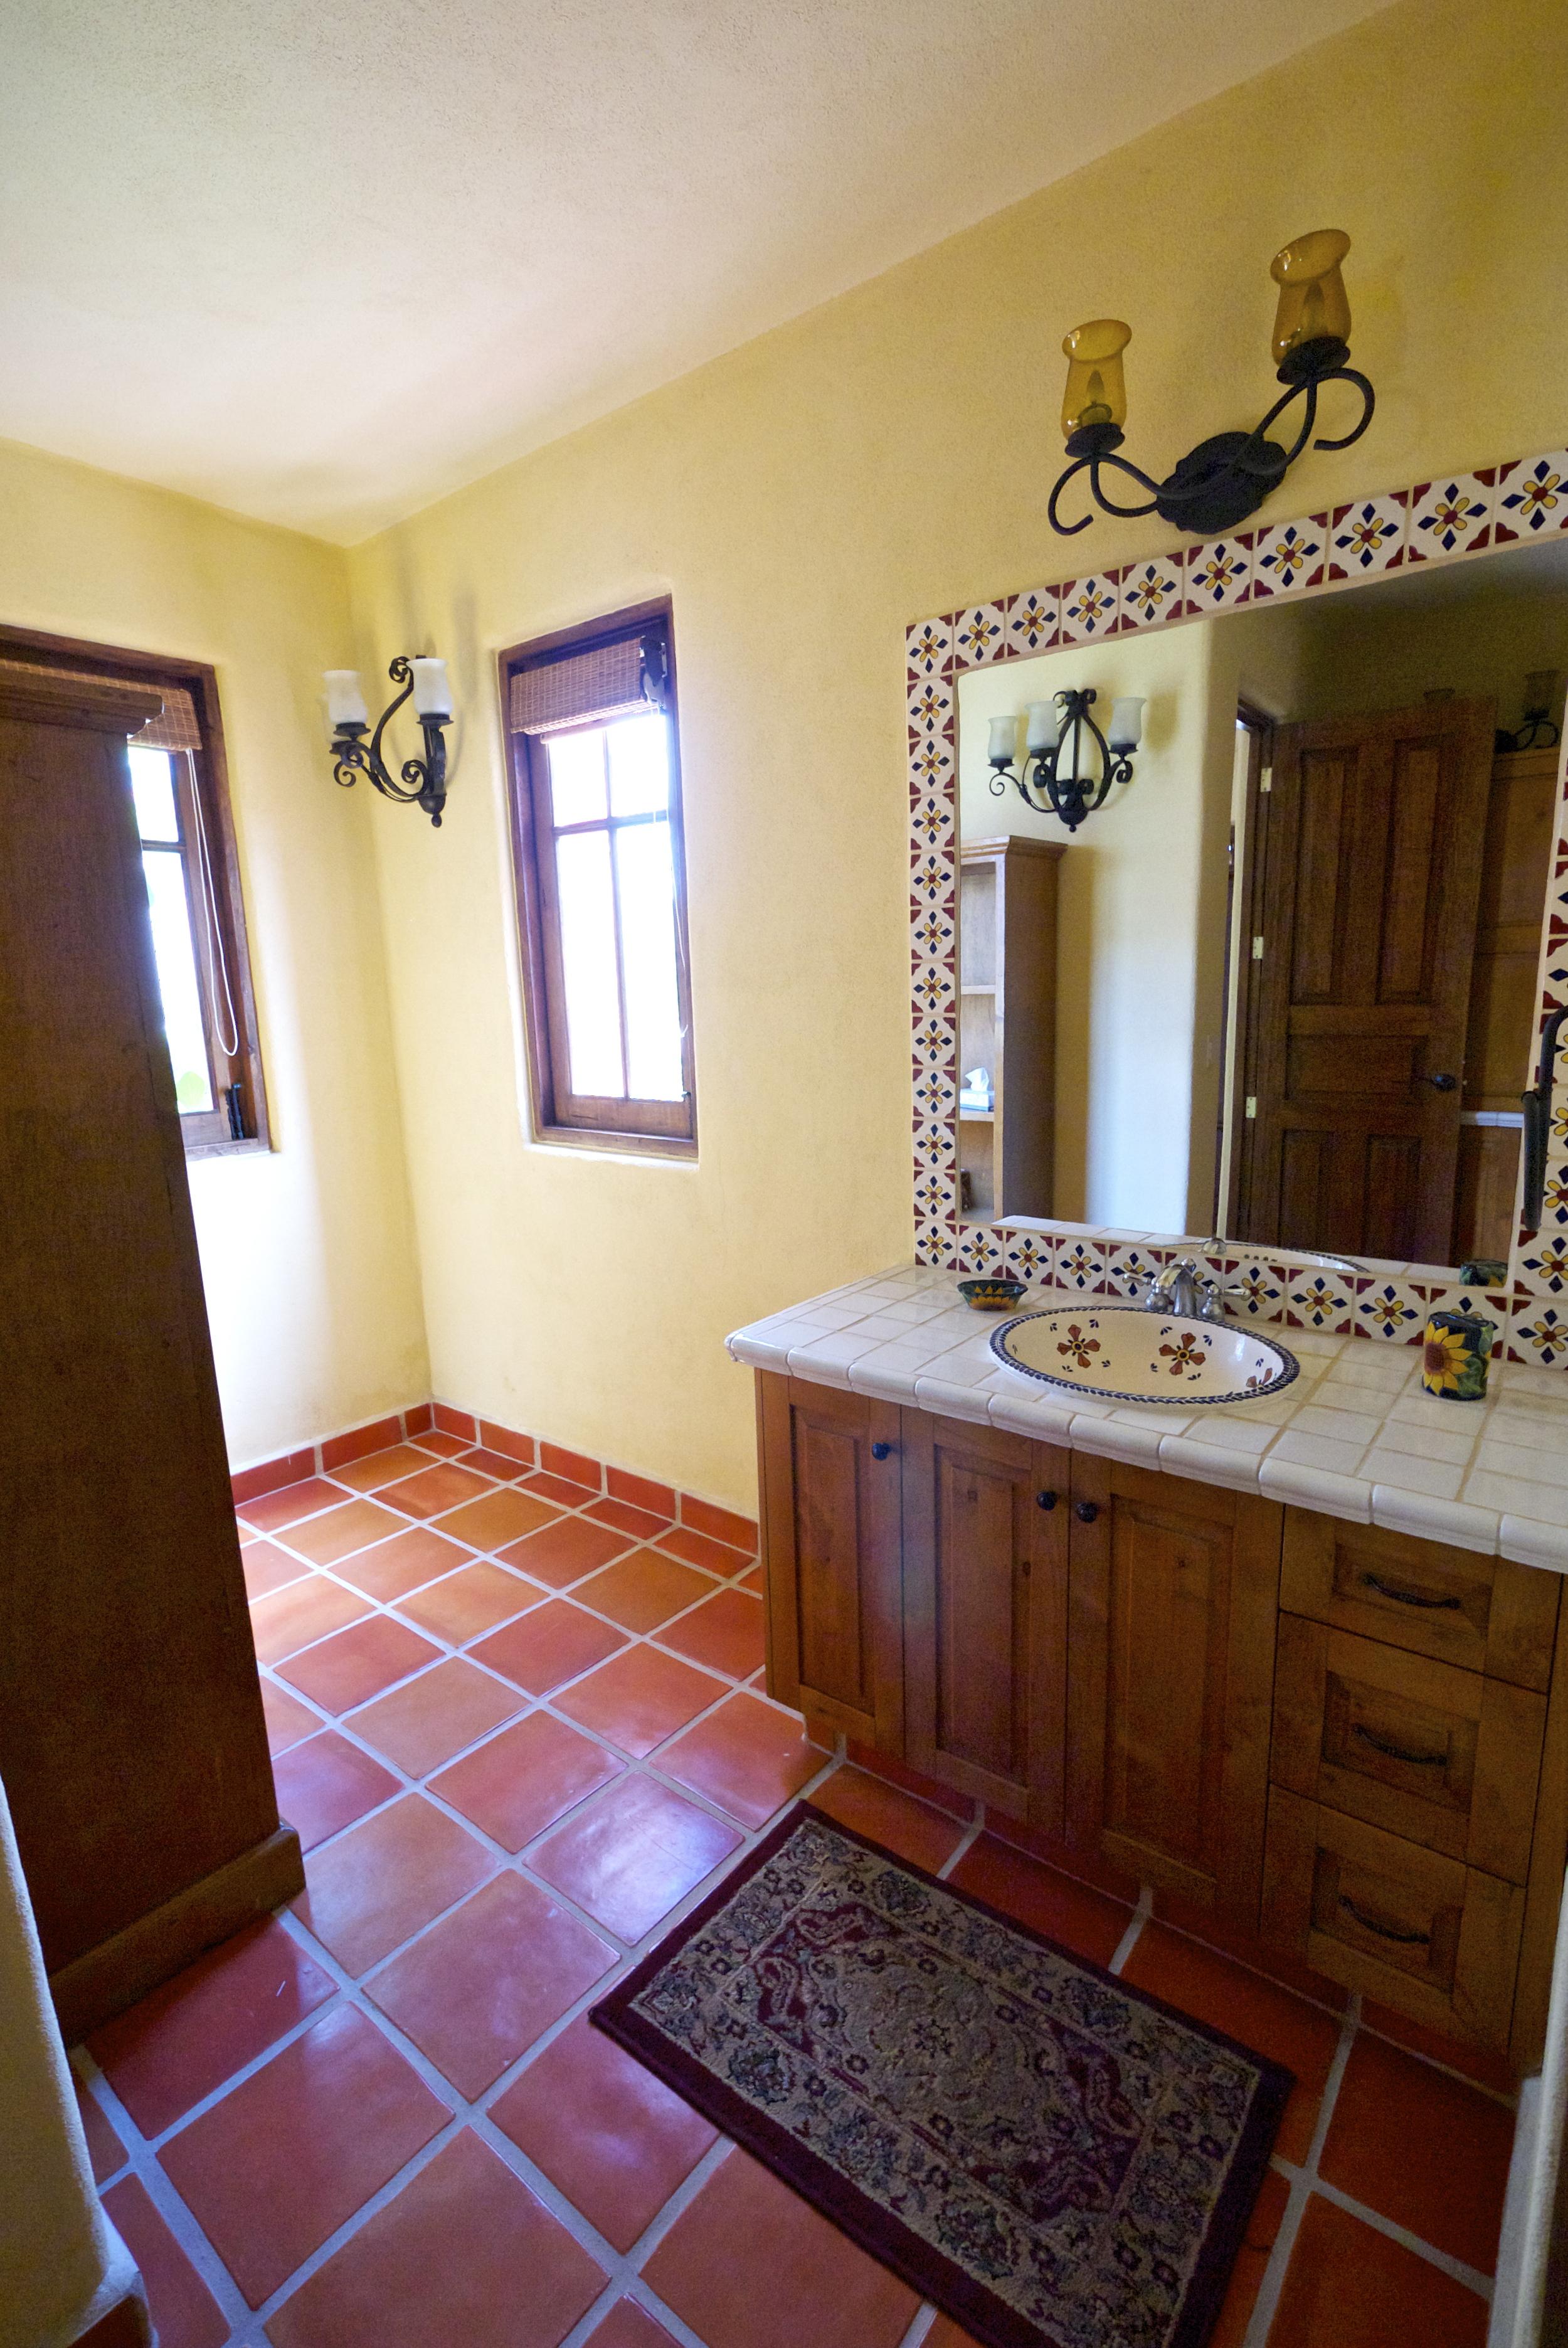 Second Floor Master Ensuite Bathroom